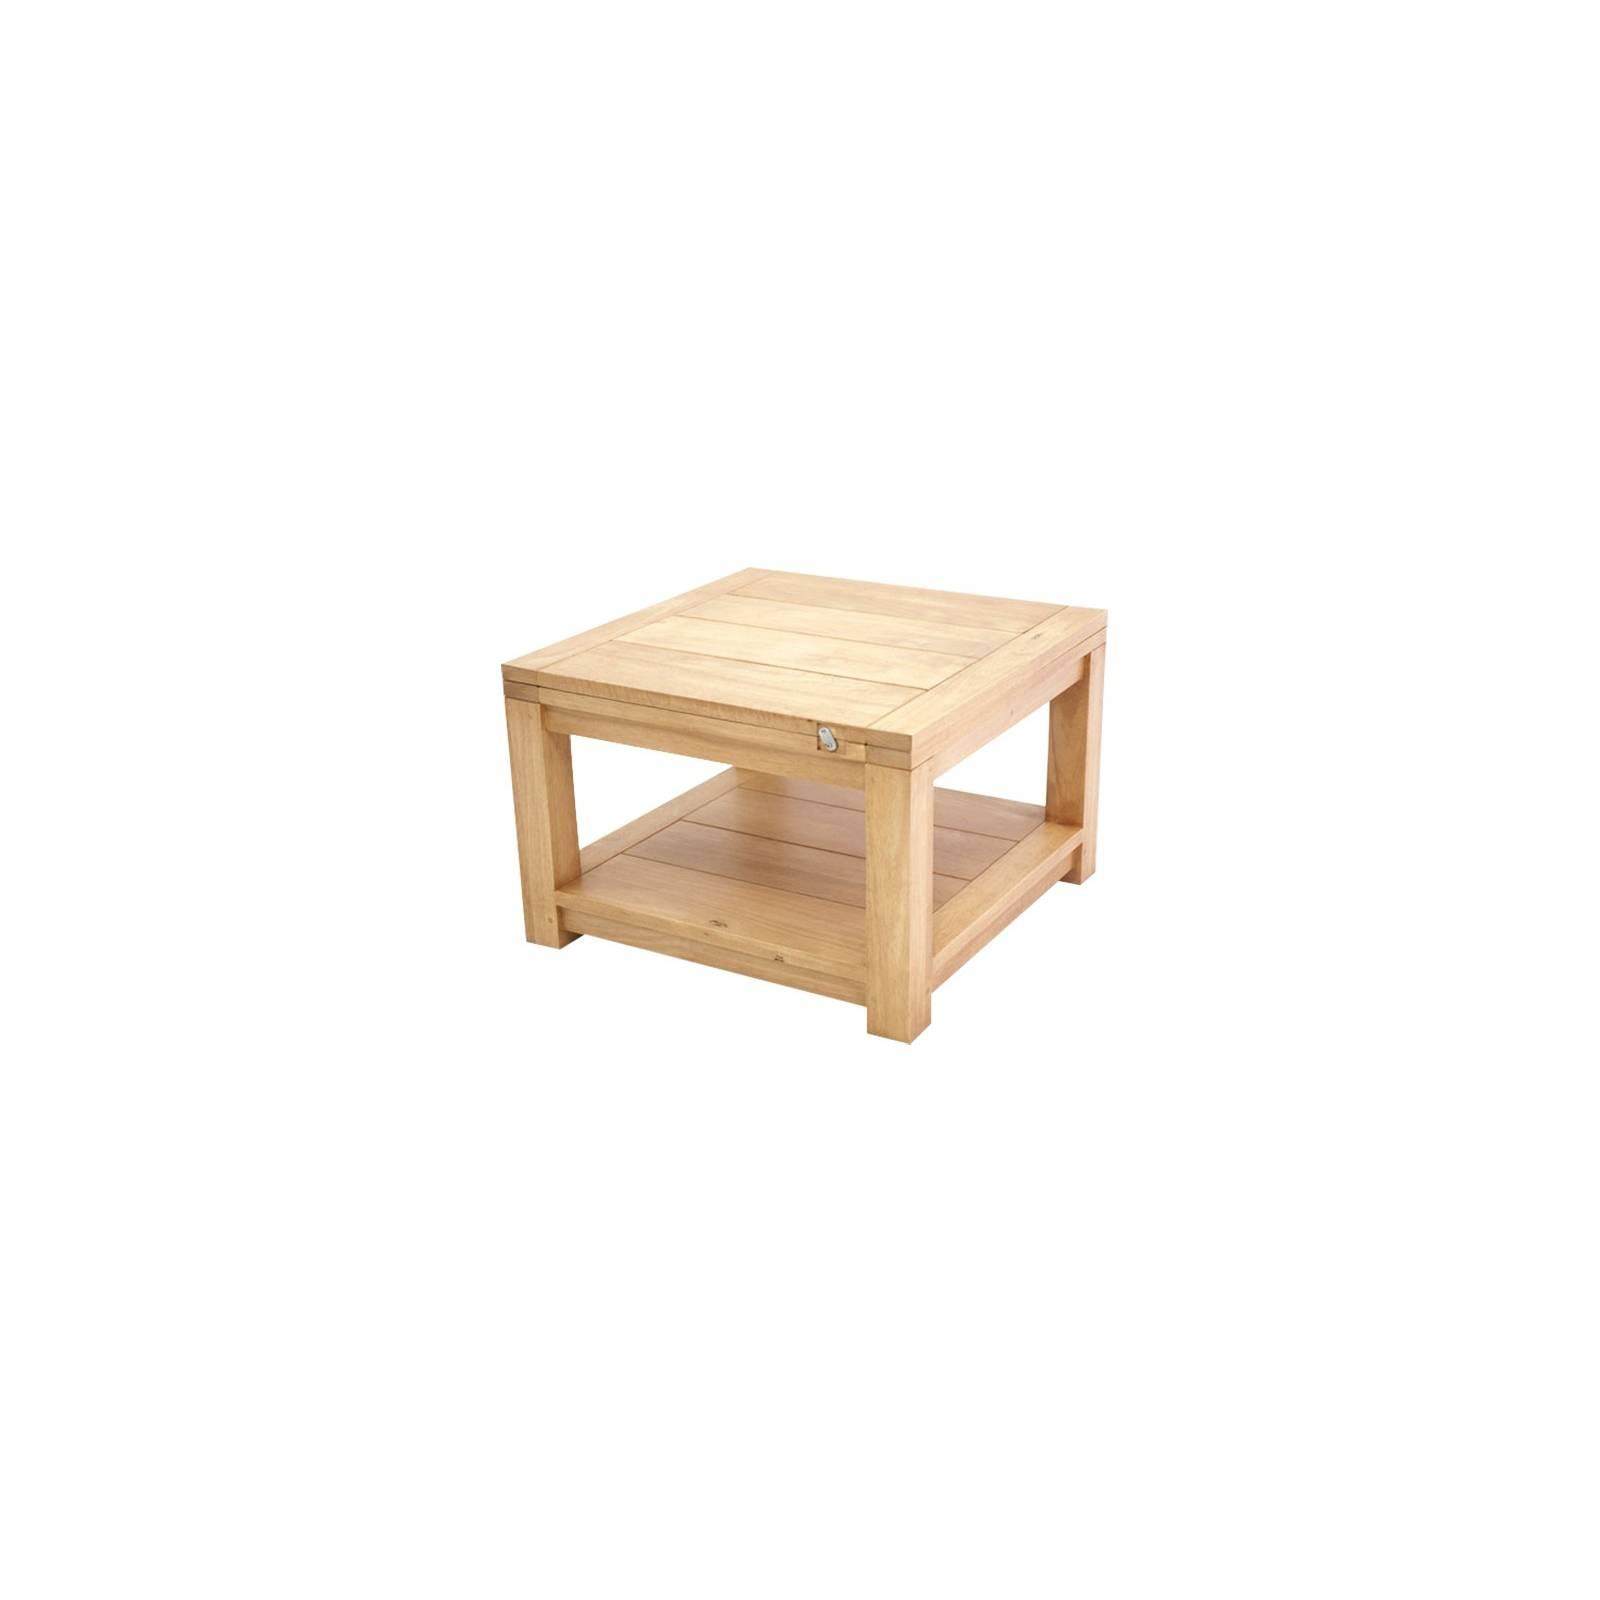 Table Basse Extensible Broadway Hévéa - meuble bois massif